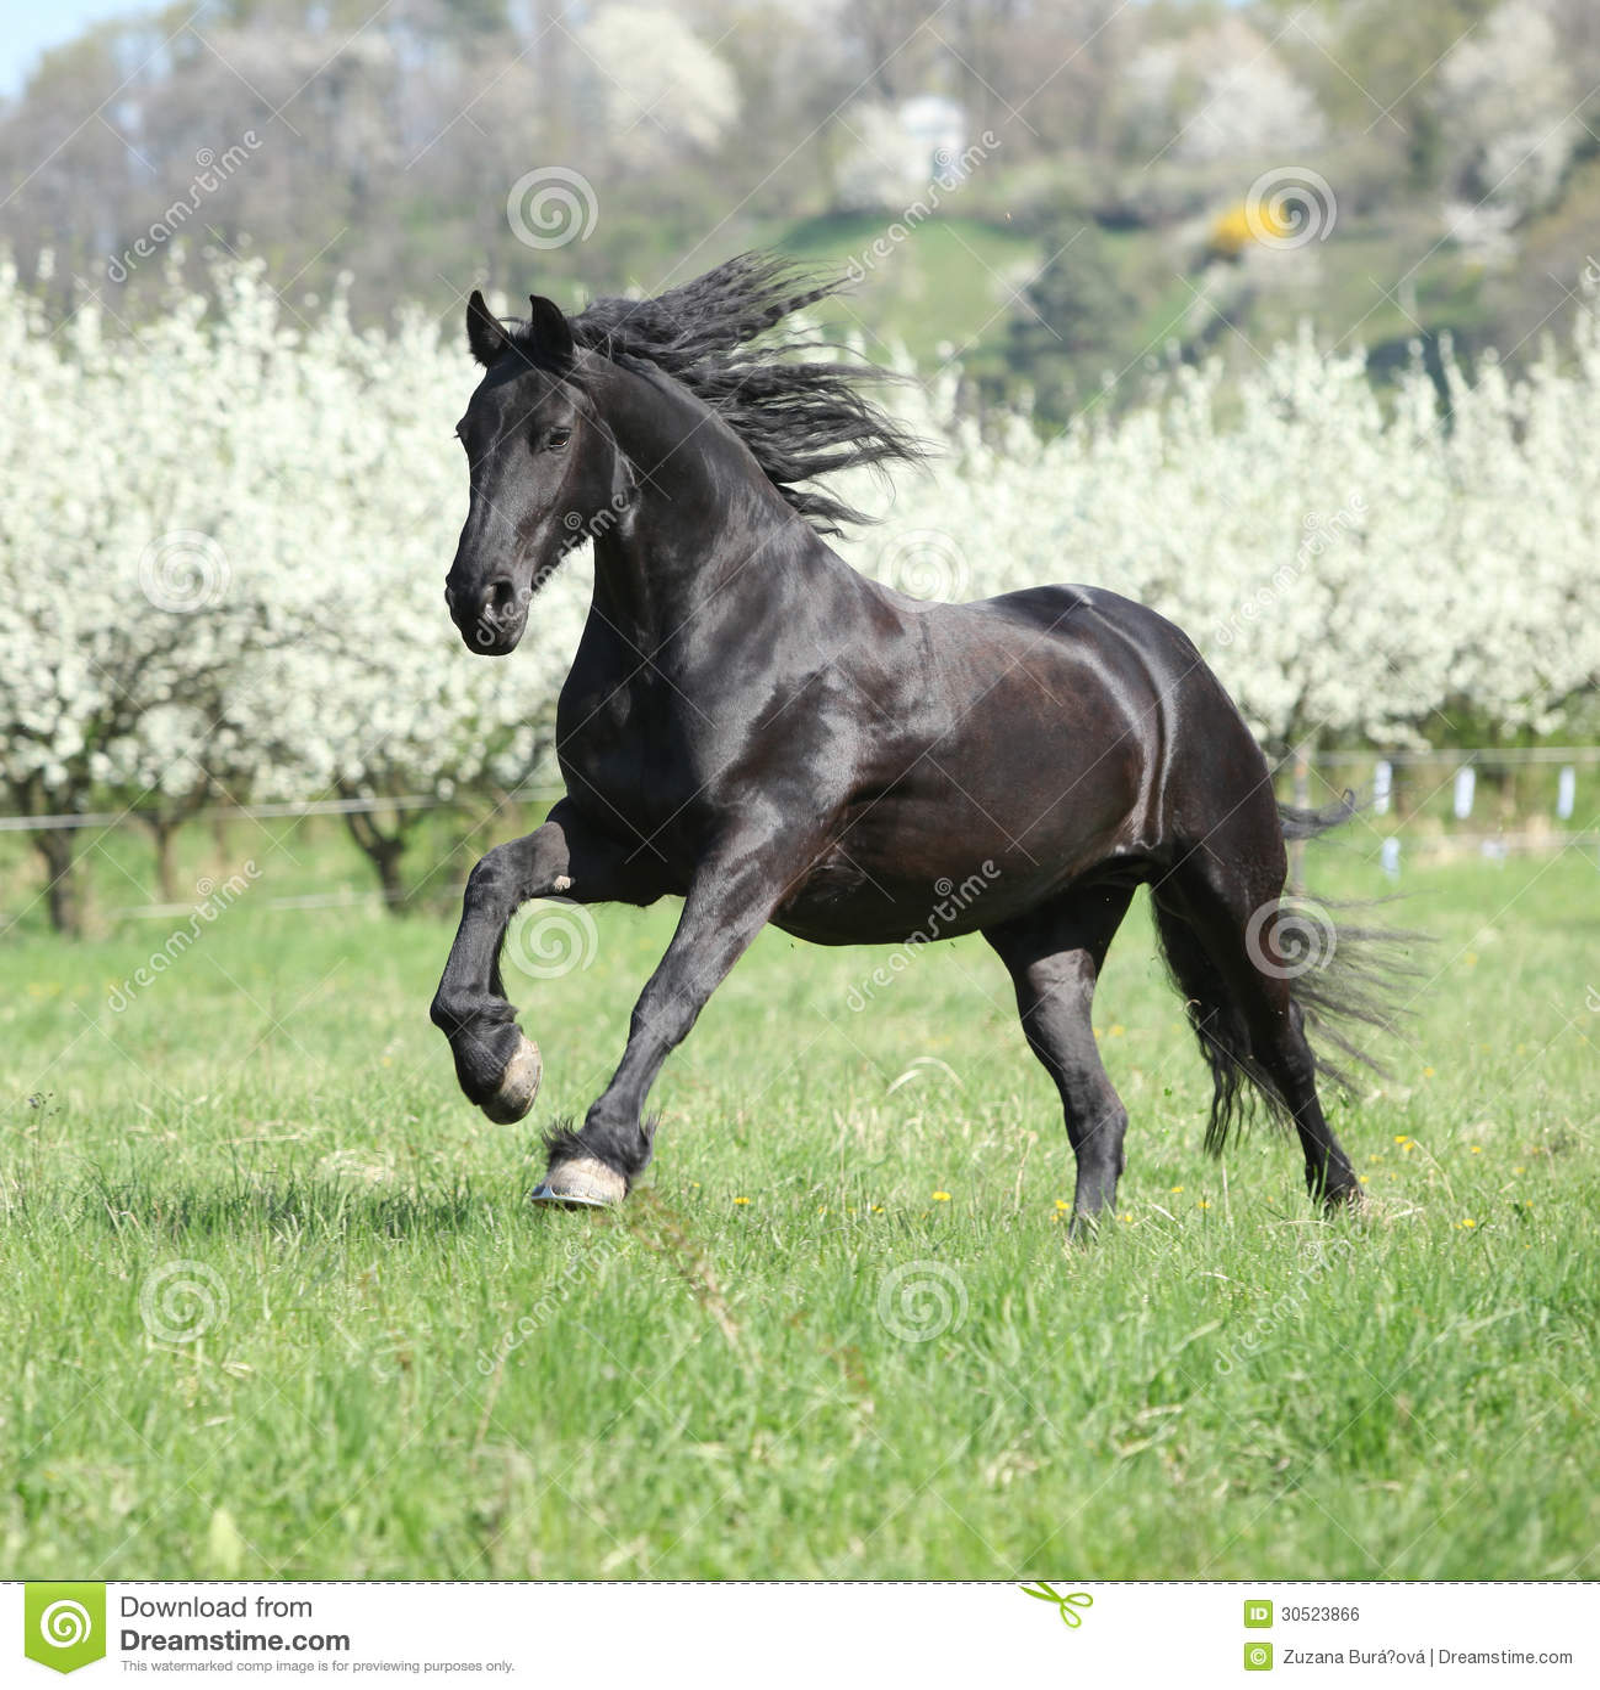 Running Friesian Horse Royalty Free Stock Images - Image ...  |Friesian Horses Running